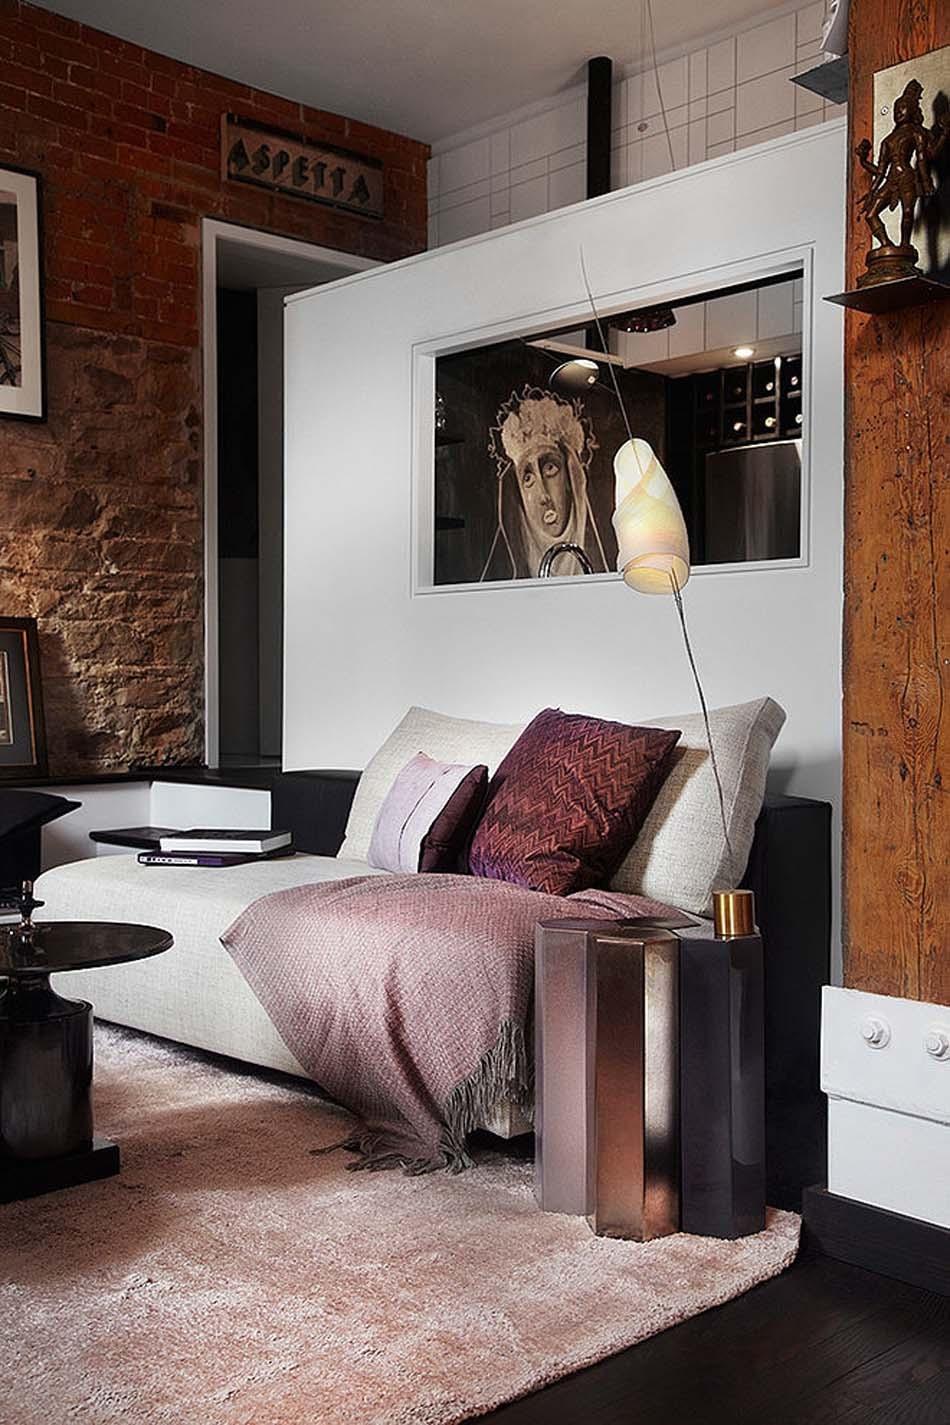 mobilier-luxe-designer-elegant